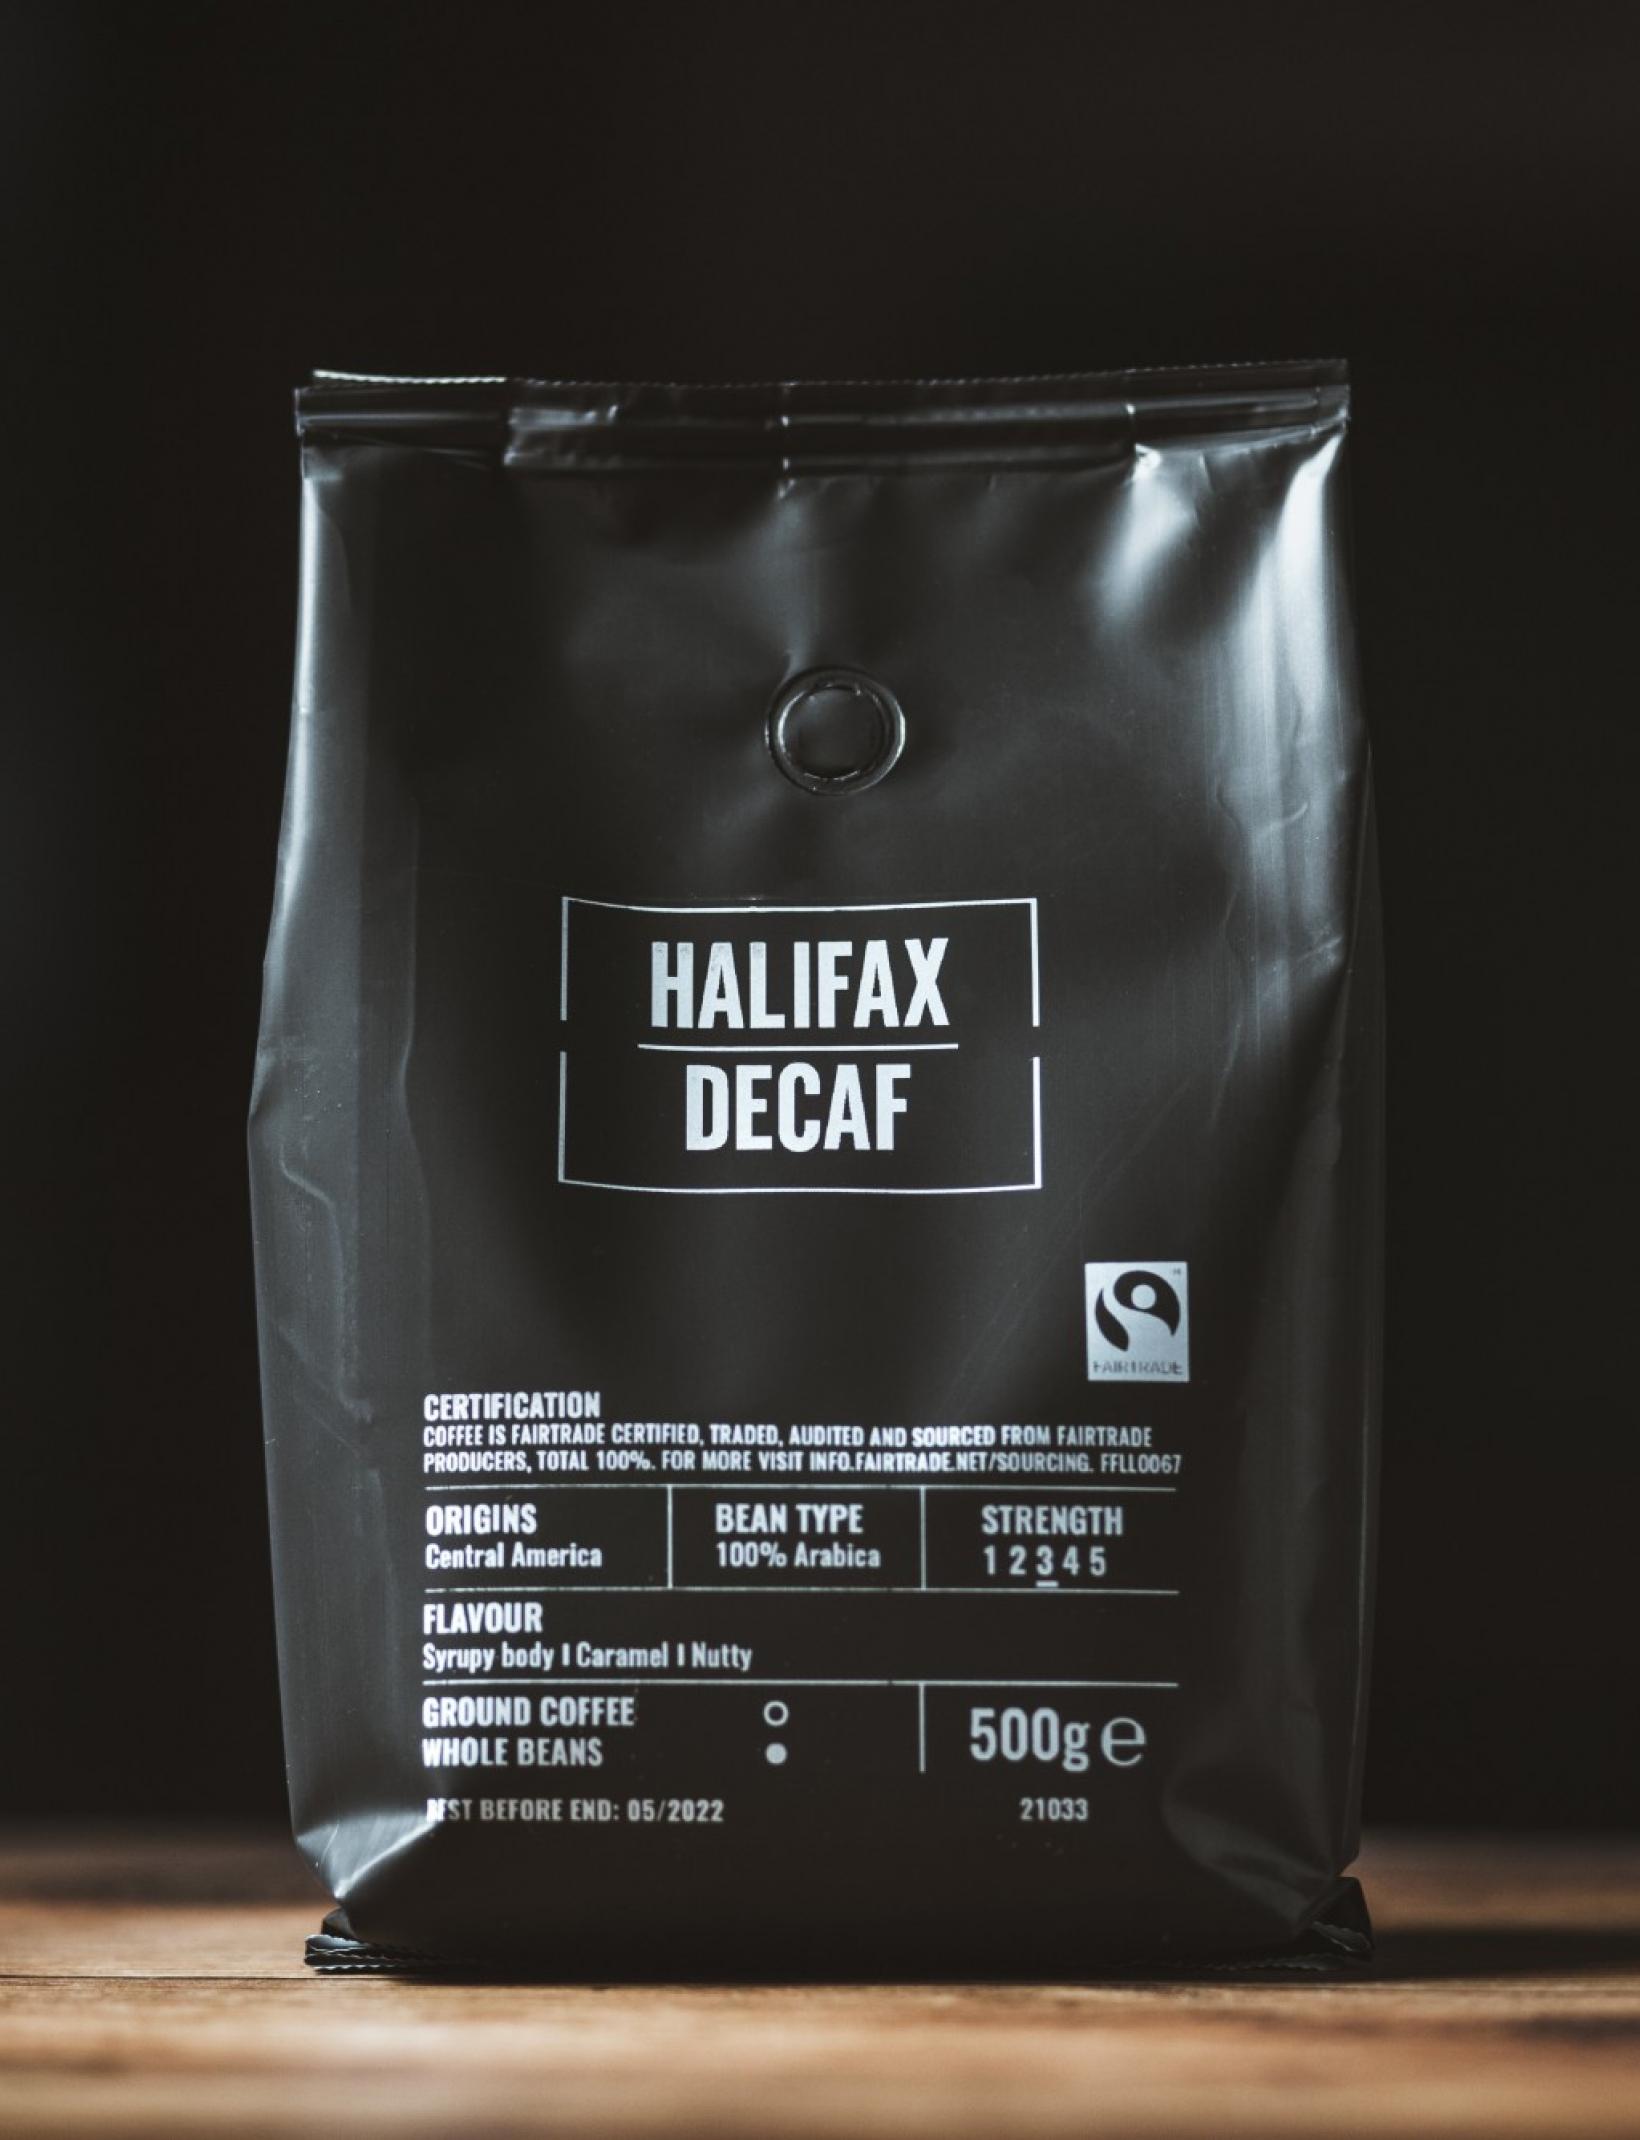 Halifax Decaf Beans